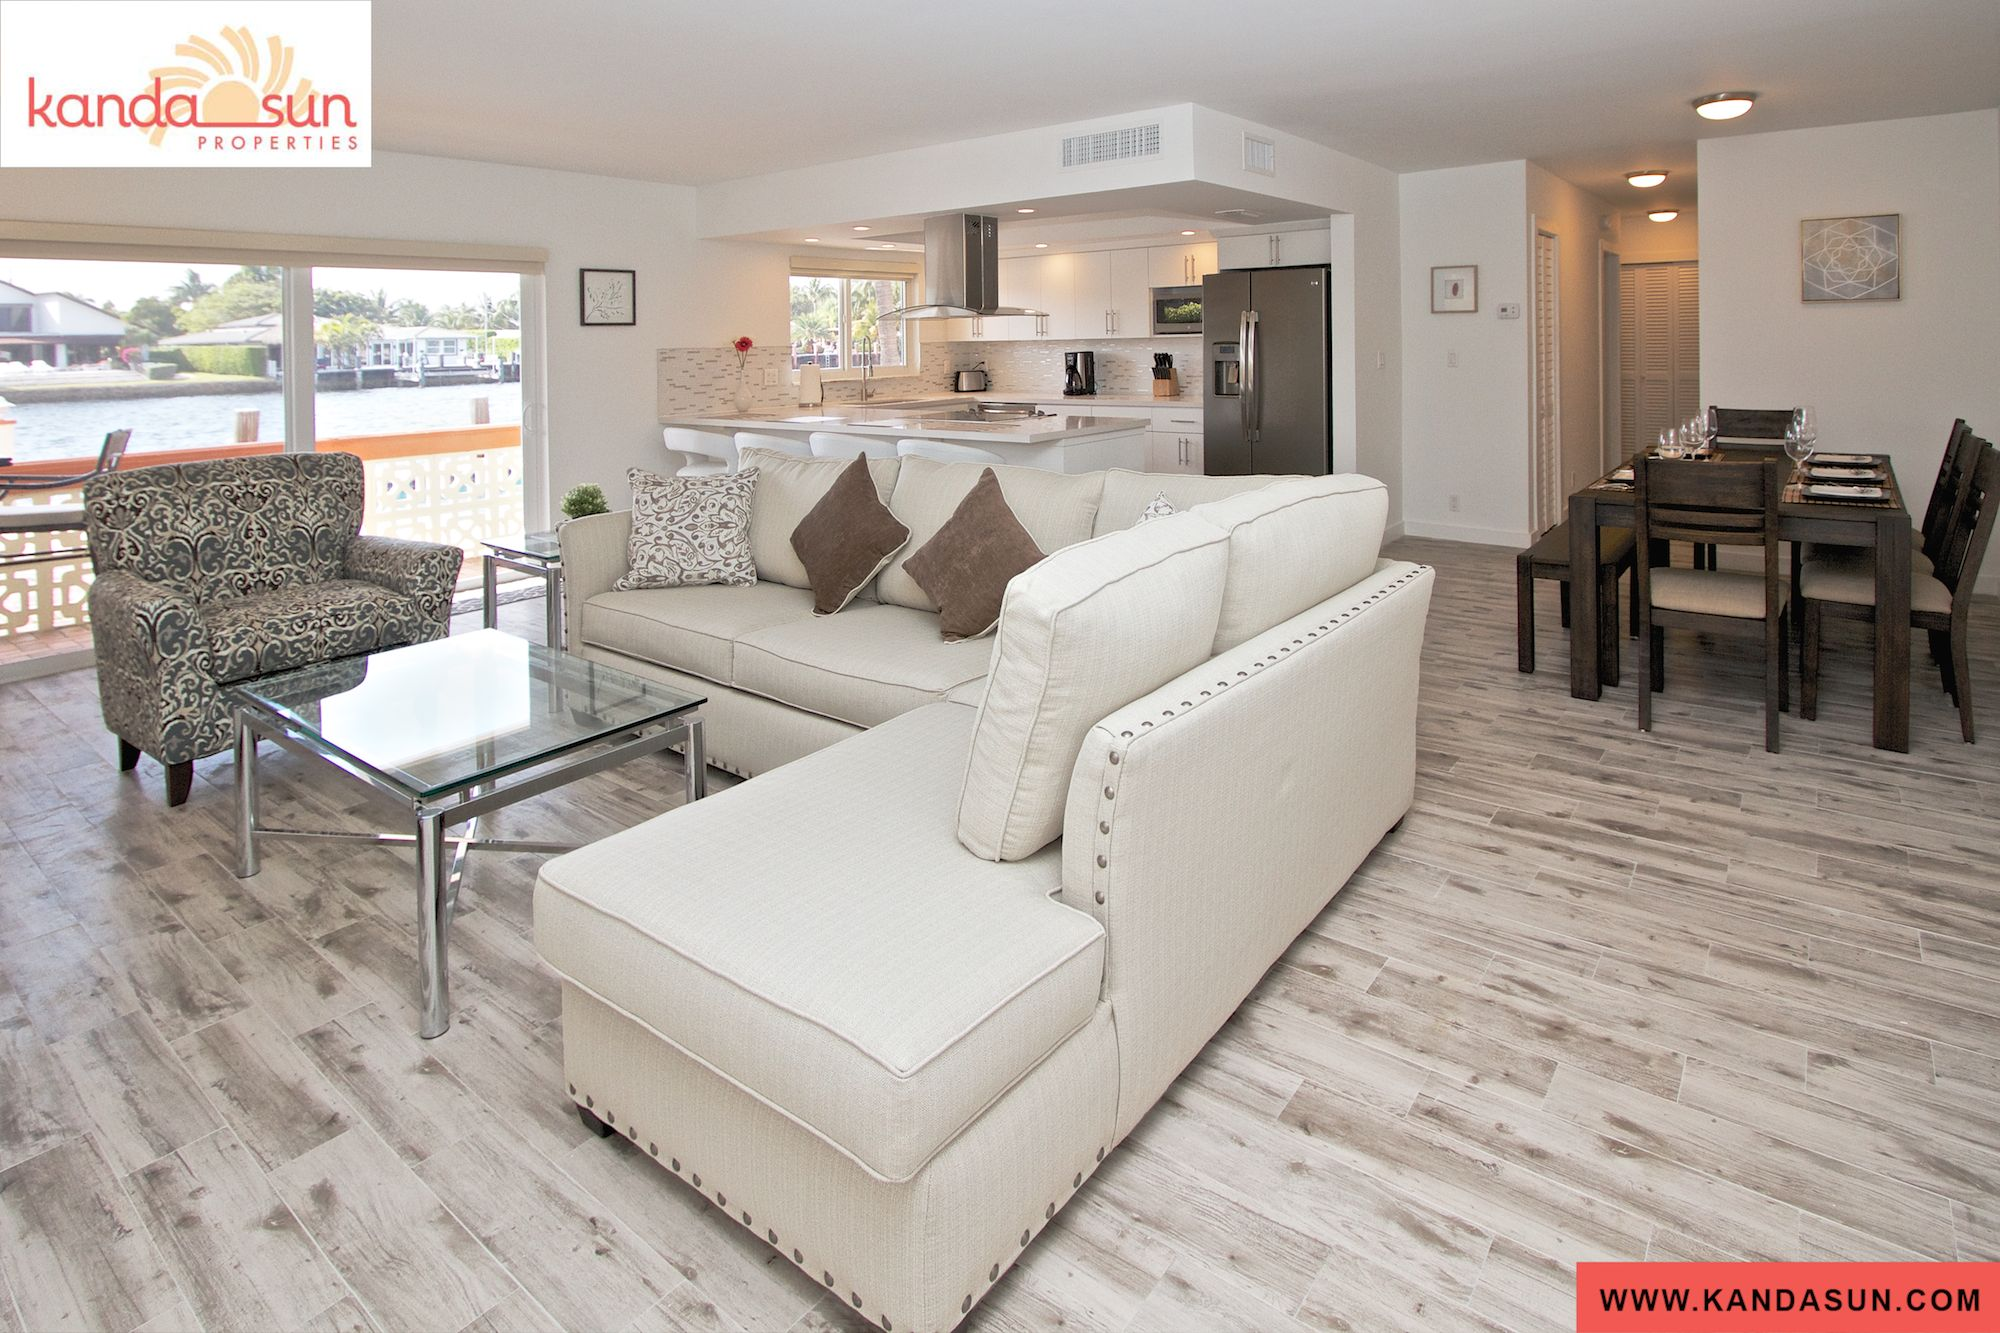 Kanda zen ground floor waterfront Badcock home furniture more pompano beach fl